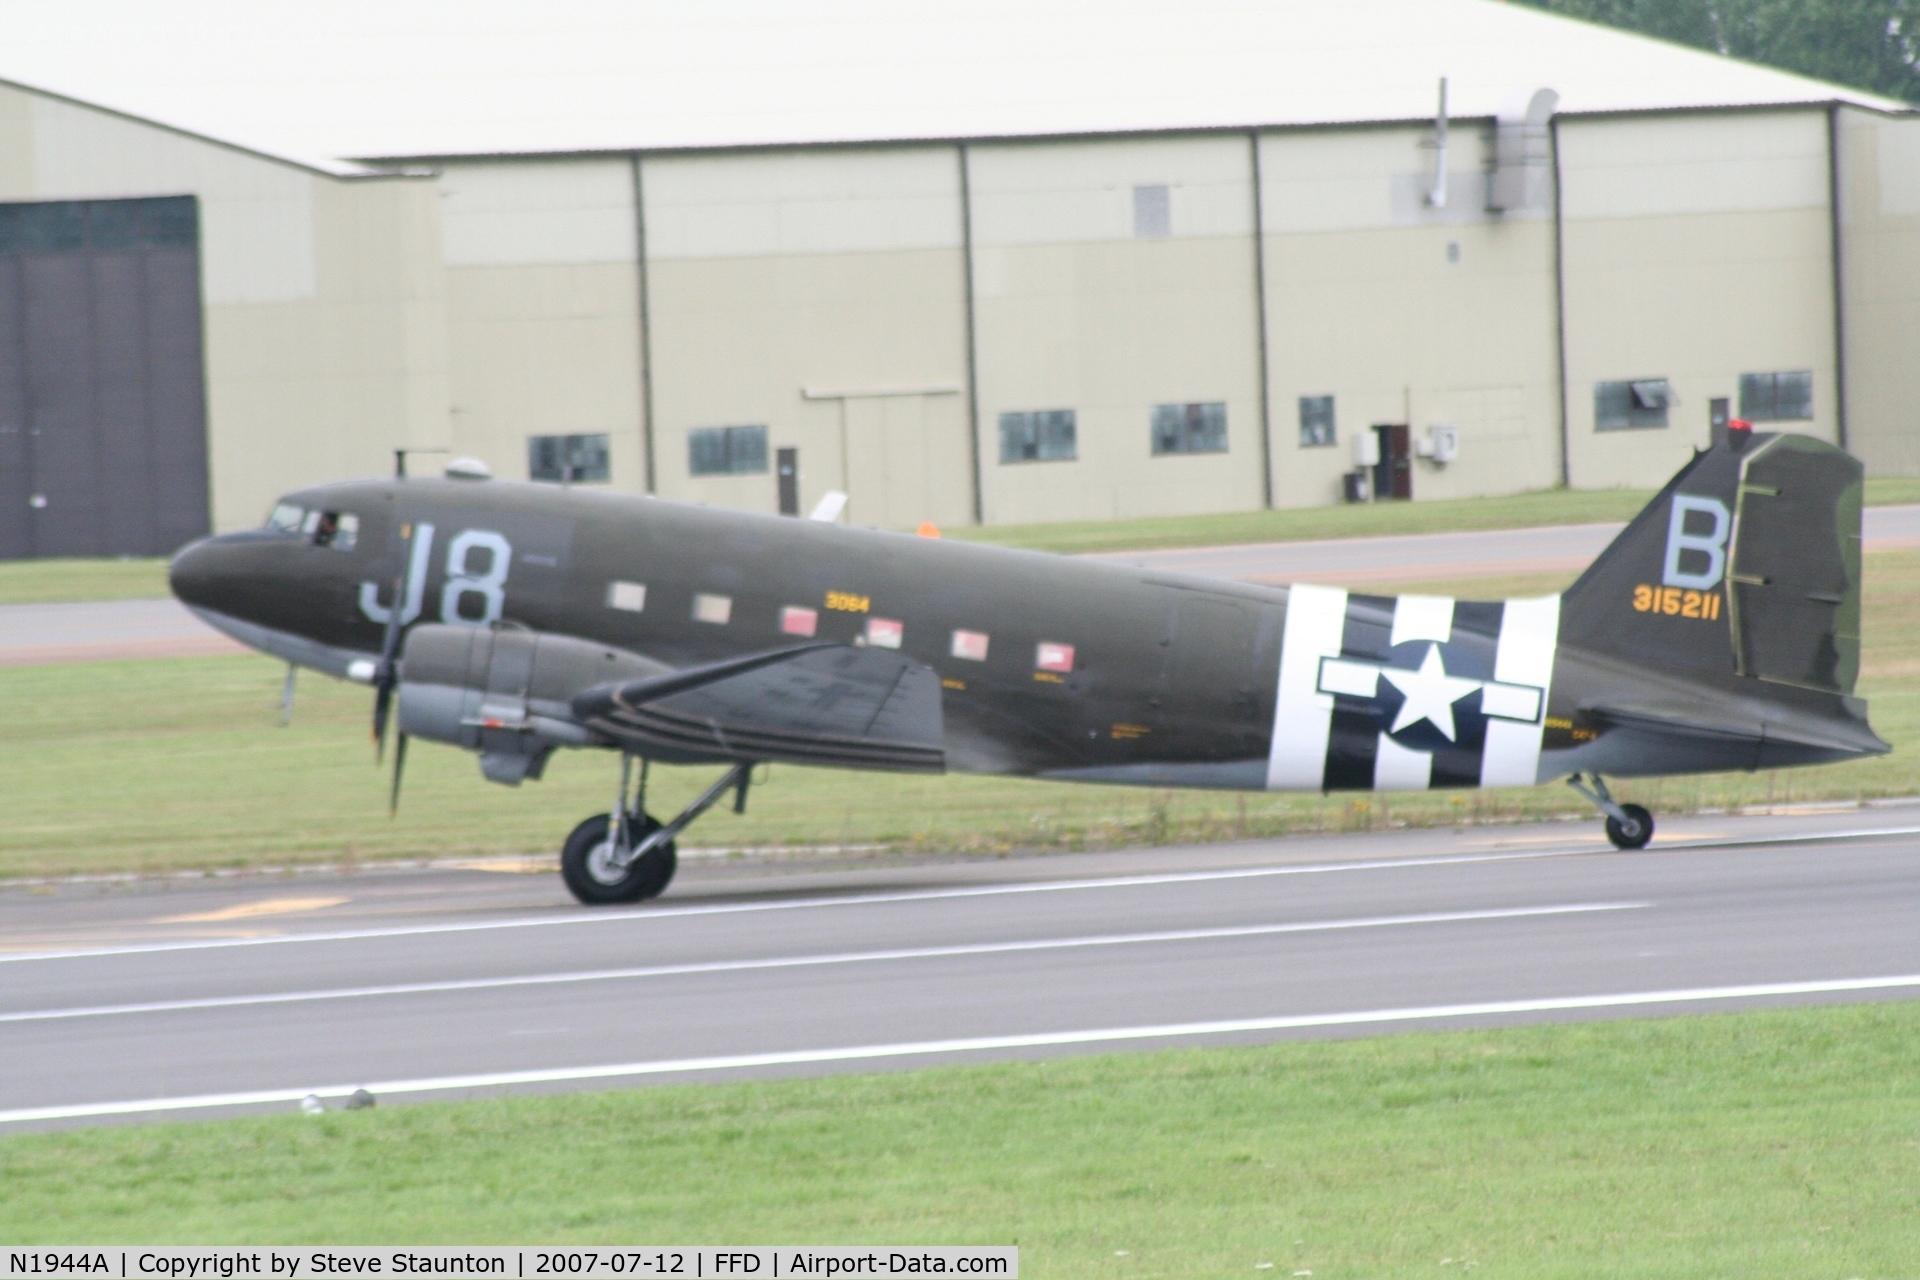 N1944A, 1944 Douglas DC3C-S1C3G C/N 19677, Royal International Air Tattoo 2007